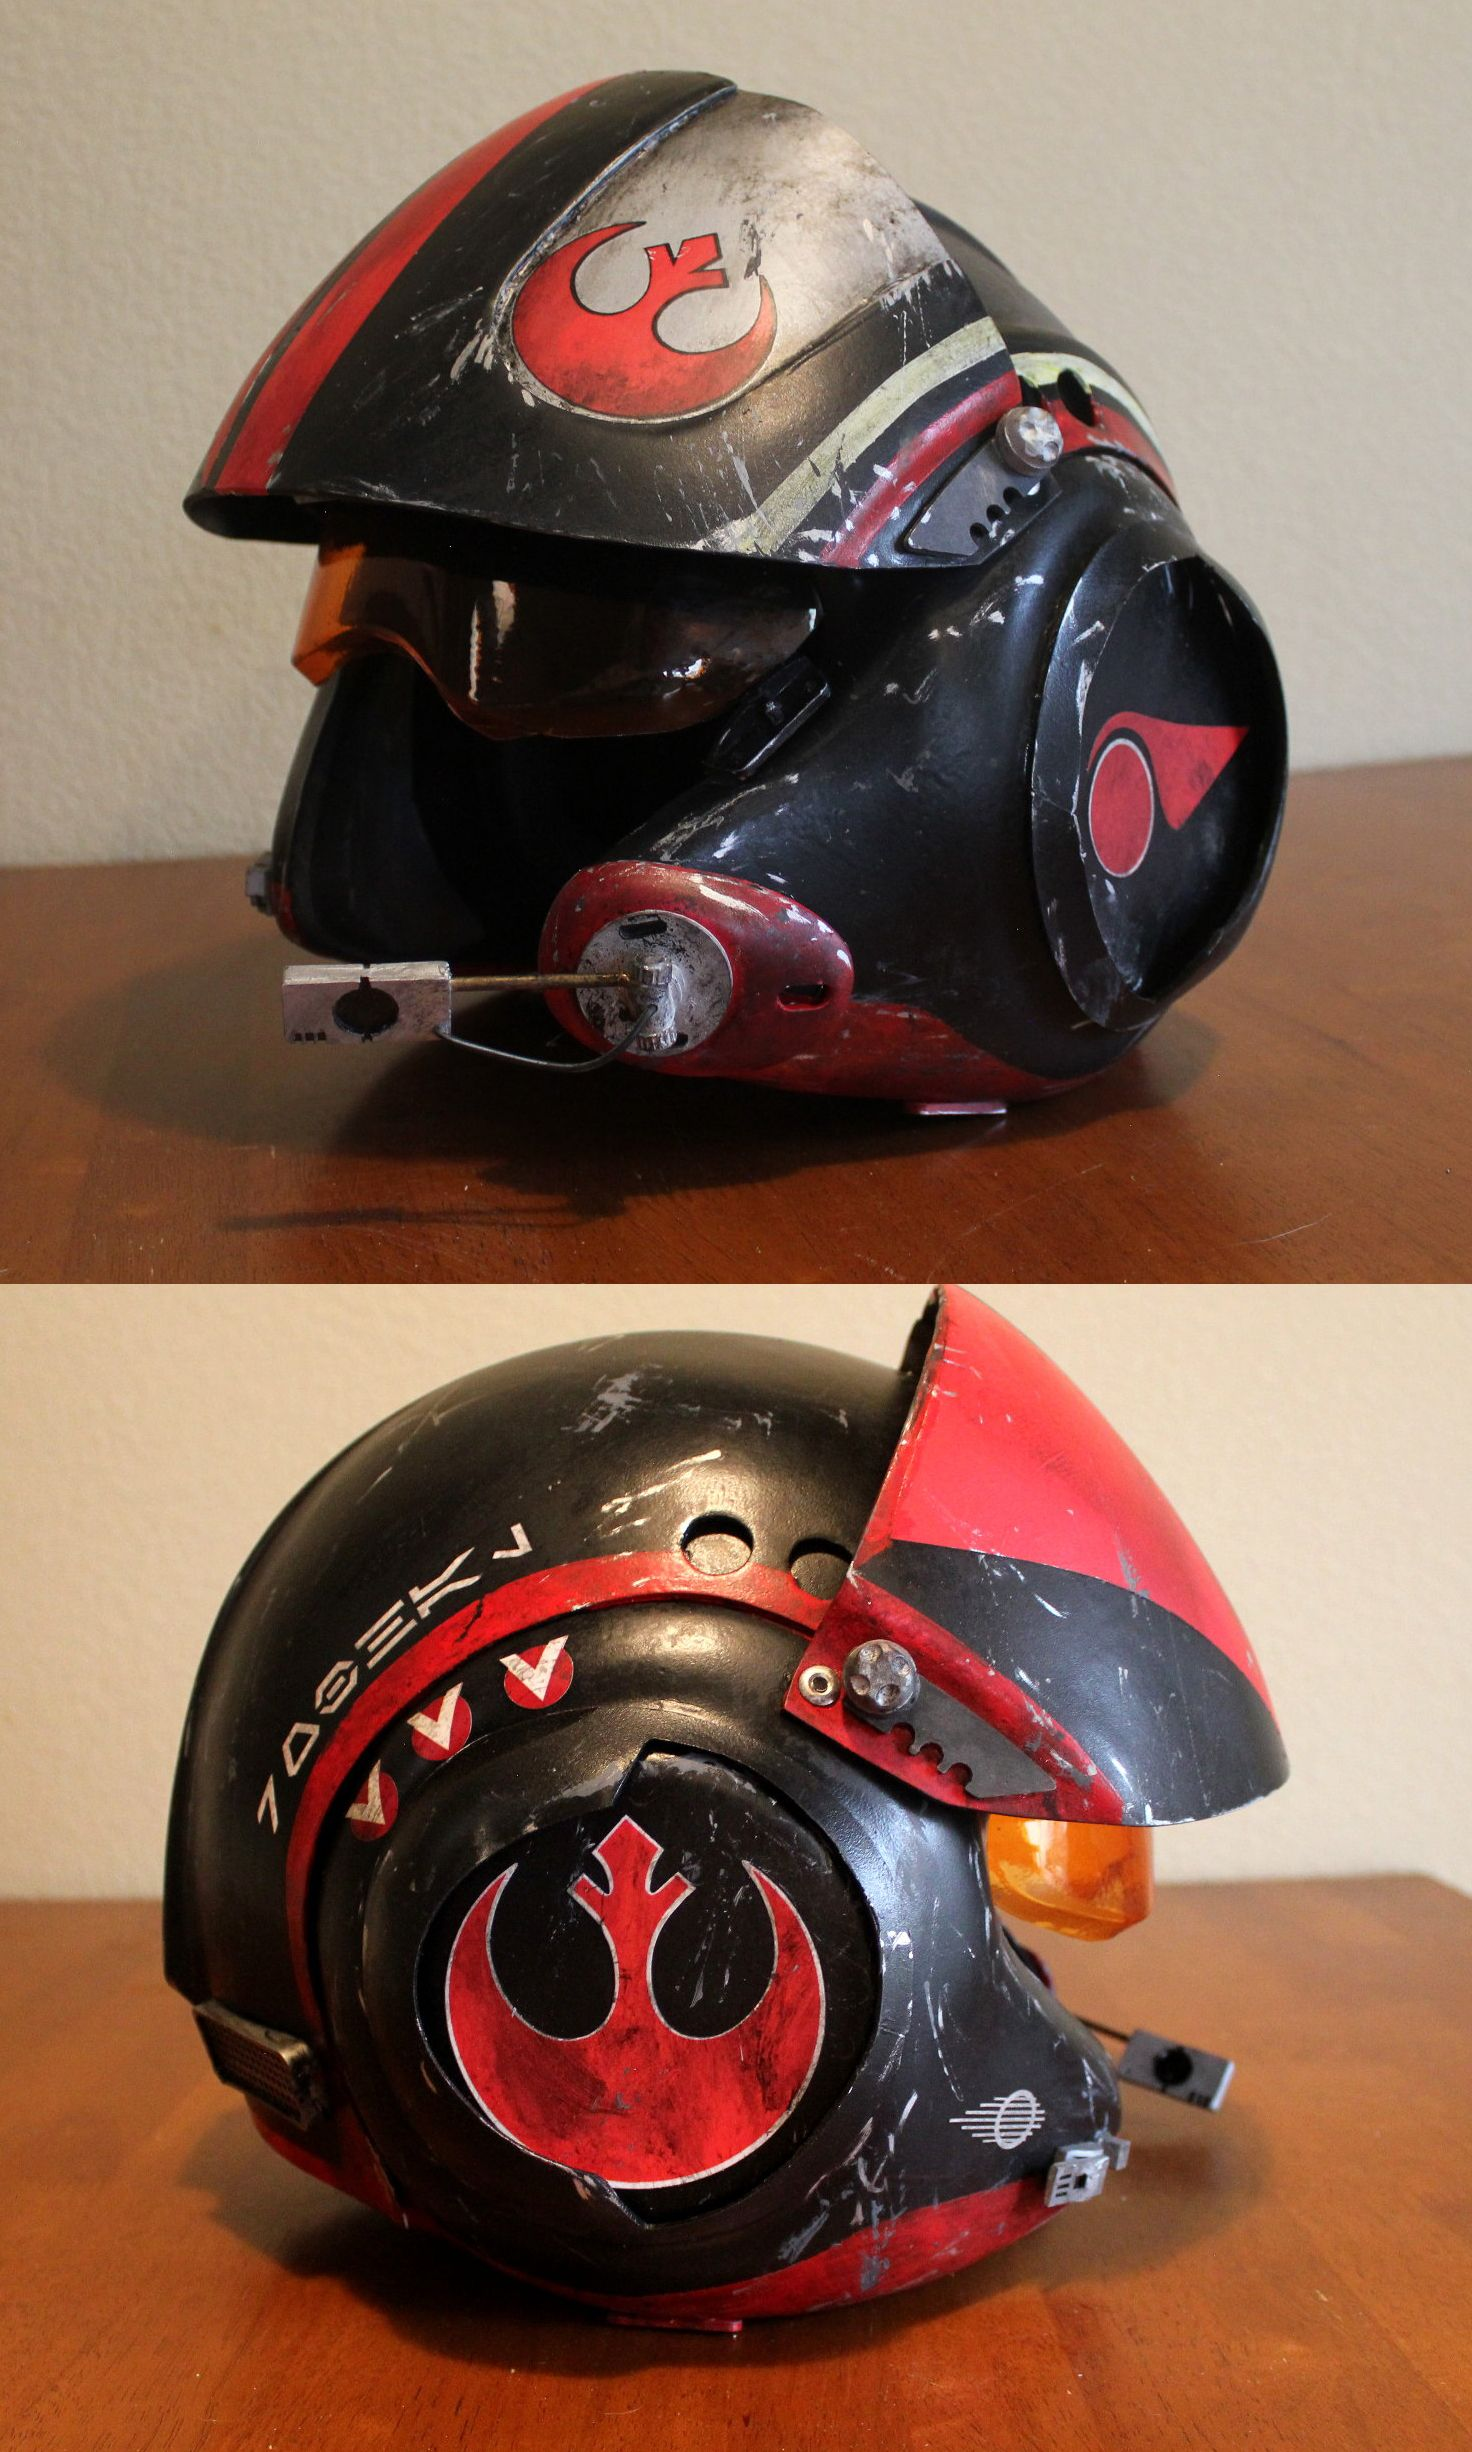 Fighter Pilot Style Motorcycle Helmet : fighter, pilot, style, motorcycle, helmet, Episode, X-wing, Pilot, Helmet, EPISODE, PILOT, HELMET, Replicas,, Custom, Fabrication,, SPECIAL, EFFECTS, Helmet,, Artwork,